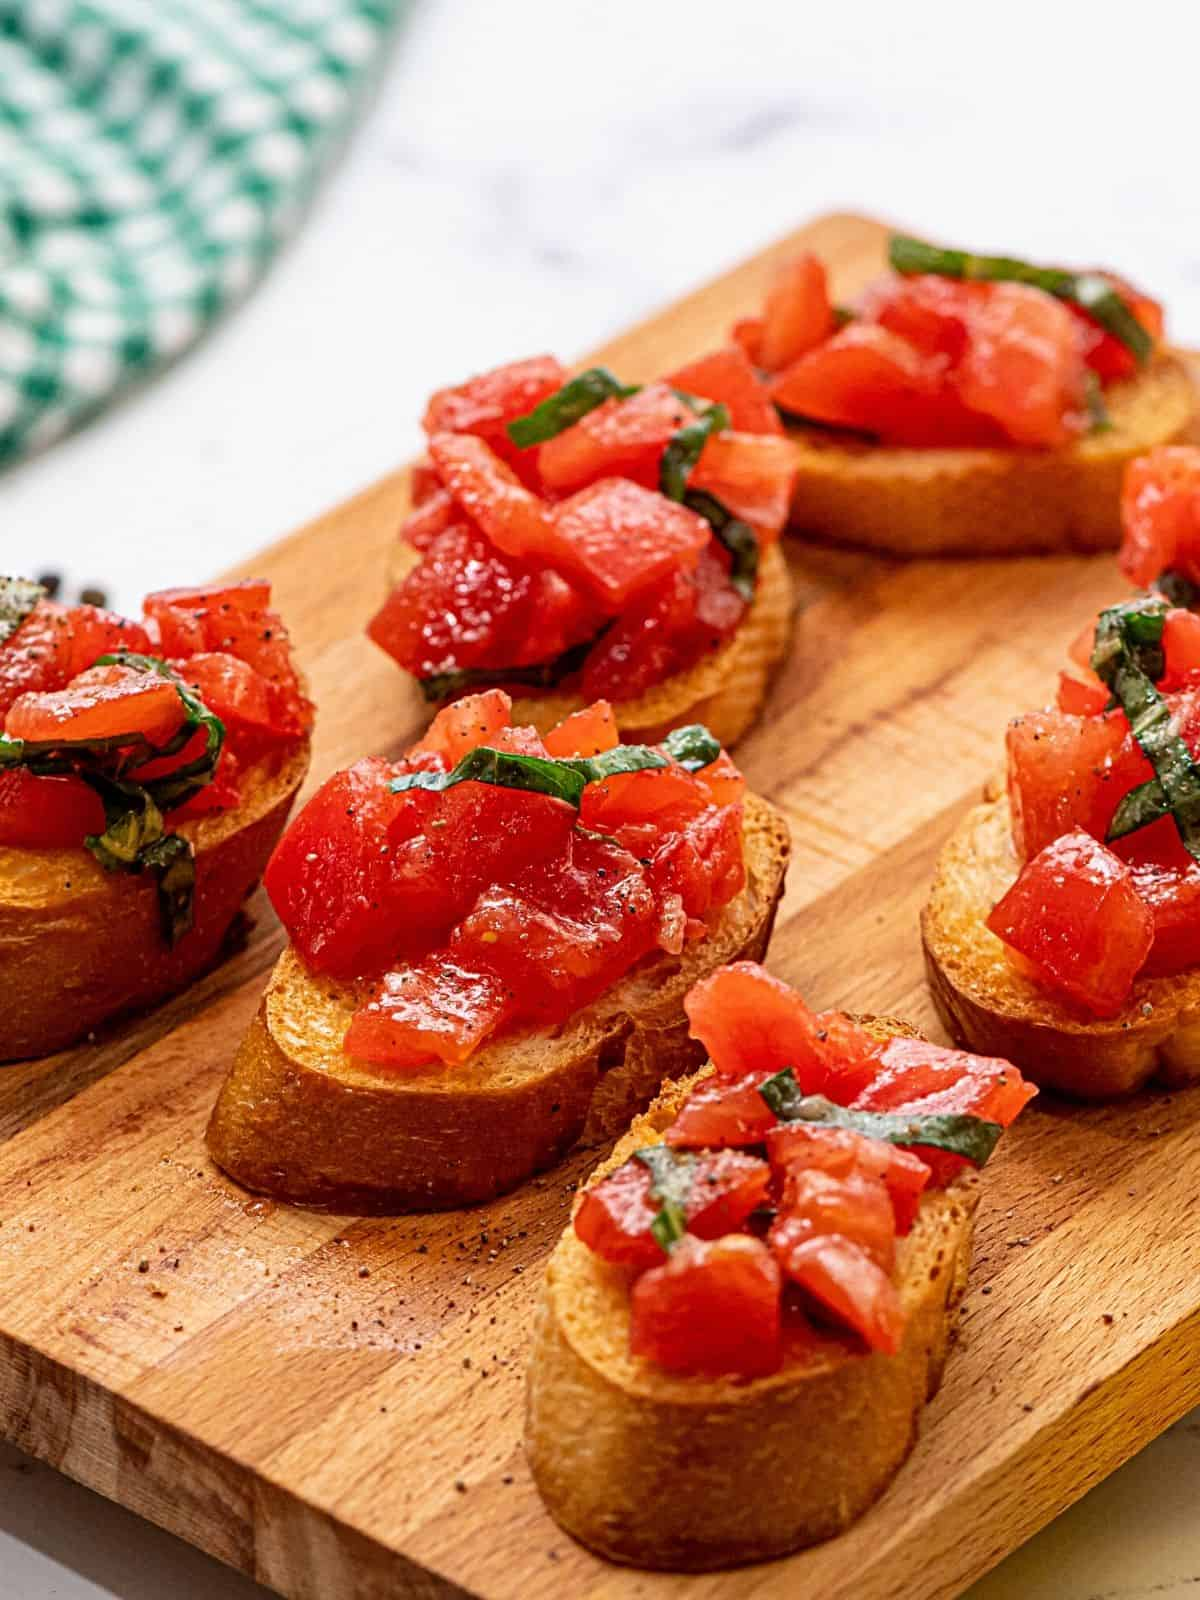 Prepared tomato bruschetta on wooden cutting board.